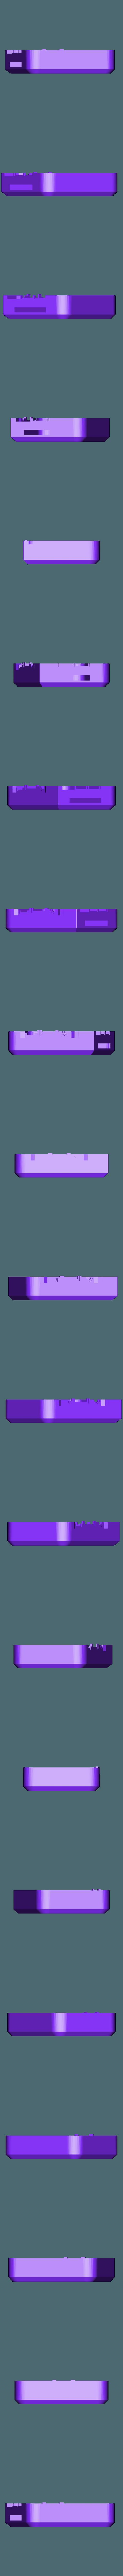 Enclosure-bottom.STL Download free STL file Raspberry Pi 3 B+ enclosure • 3D printable model, kgitman